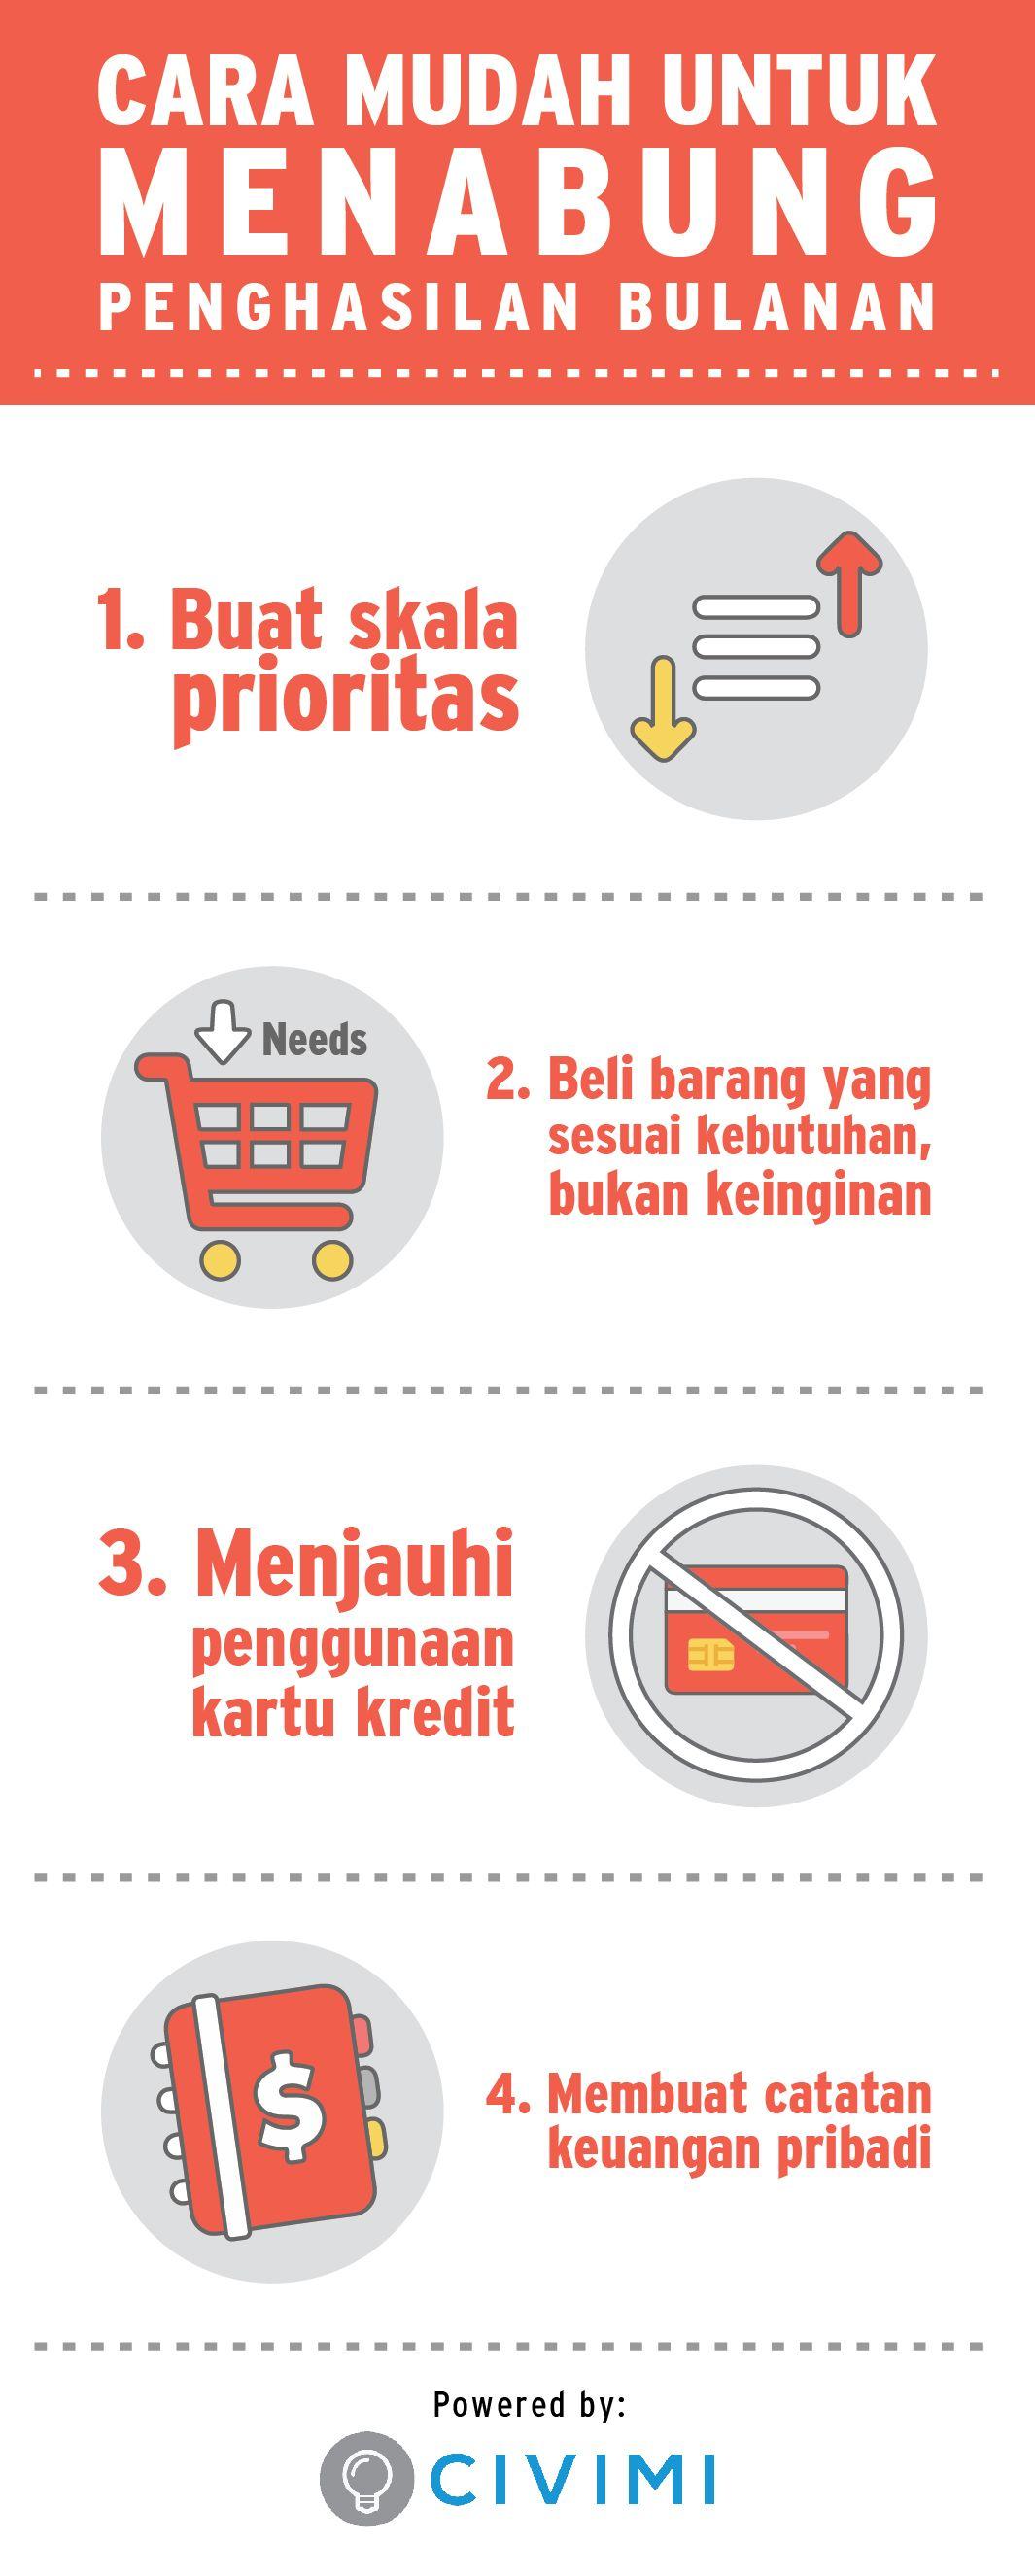 Inilah Bahaya diet mayo yang berlebihan untuk kesehatan (#wajib)